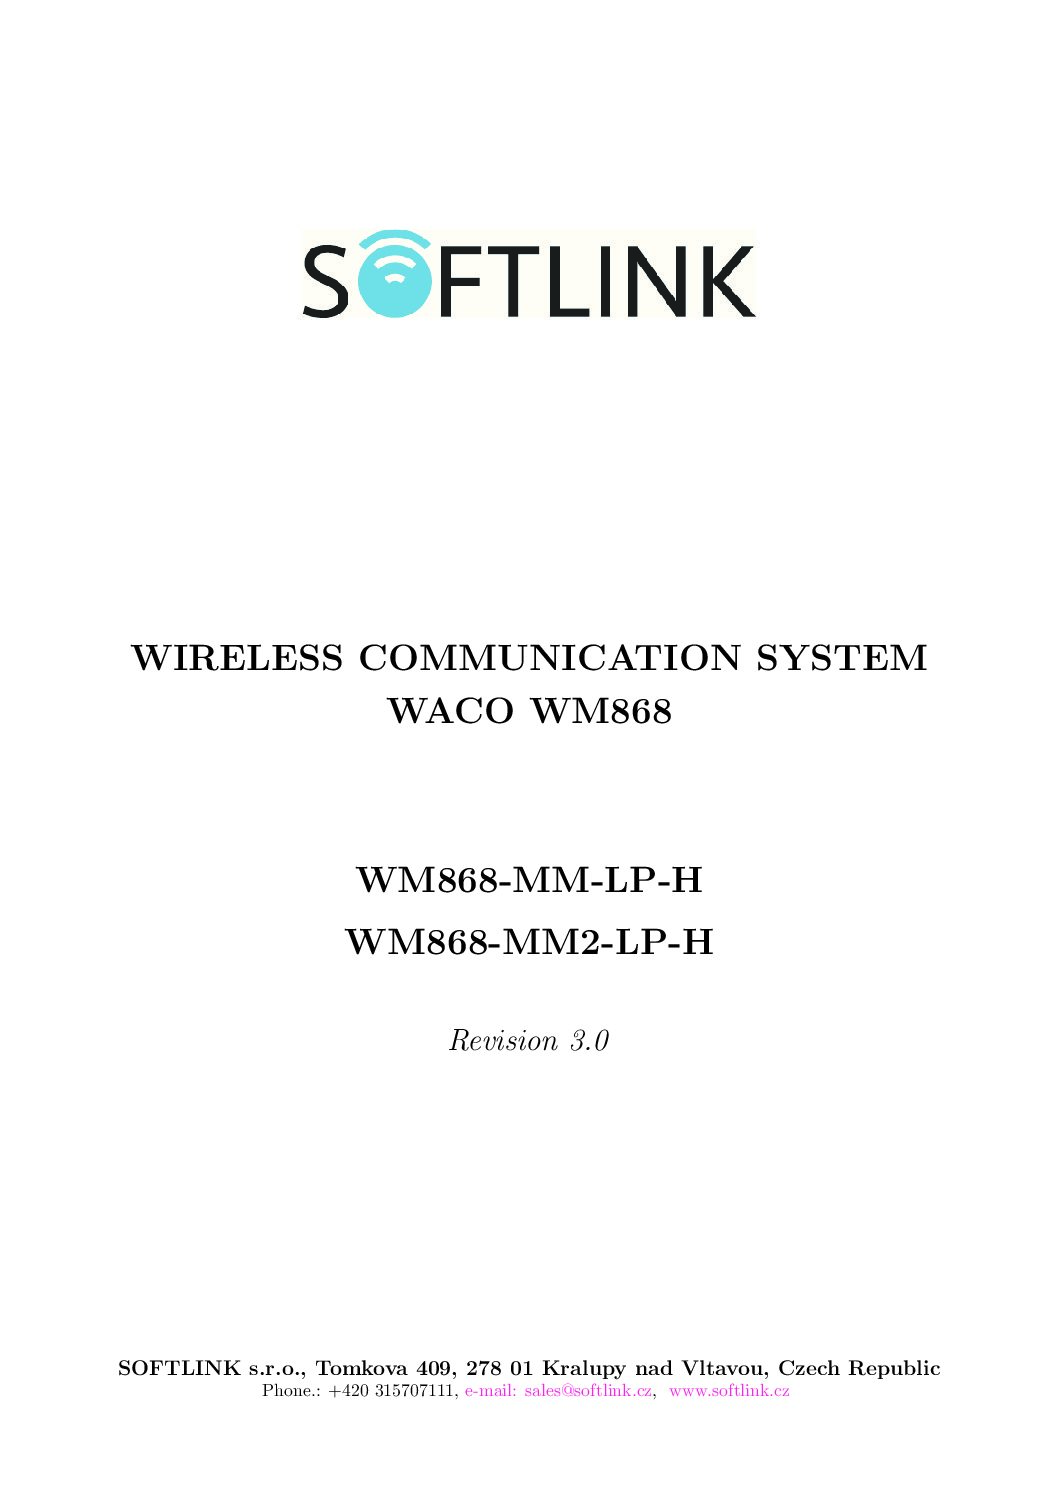 Manual_WM868-MM-LP-H-EN